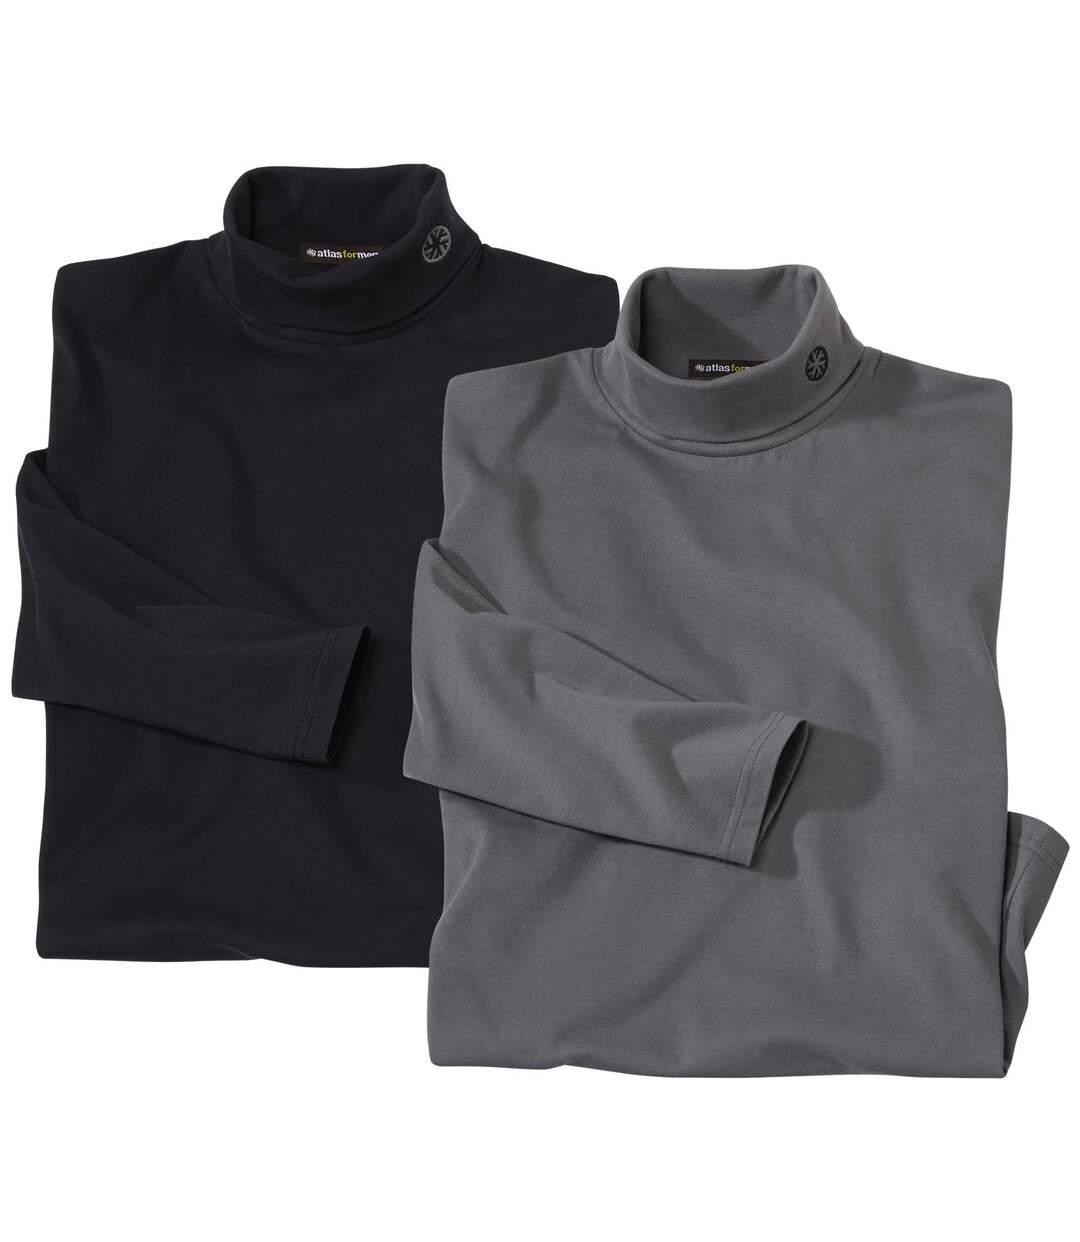 Pack of 2 Men's Turtleneck Tops - Black, Grey Atlas For Men